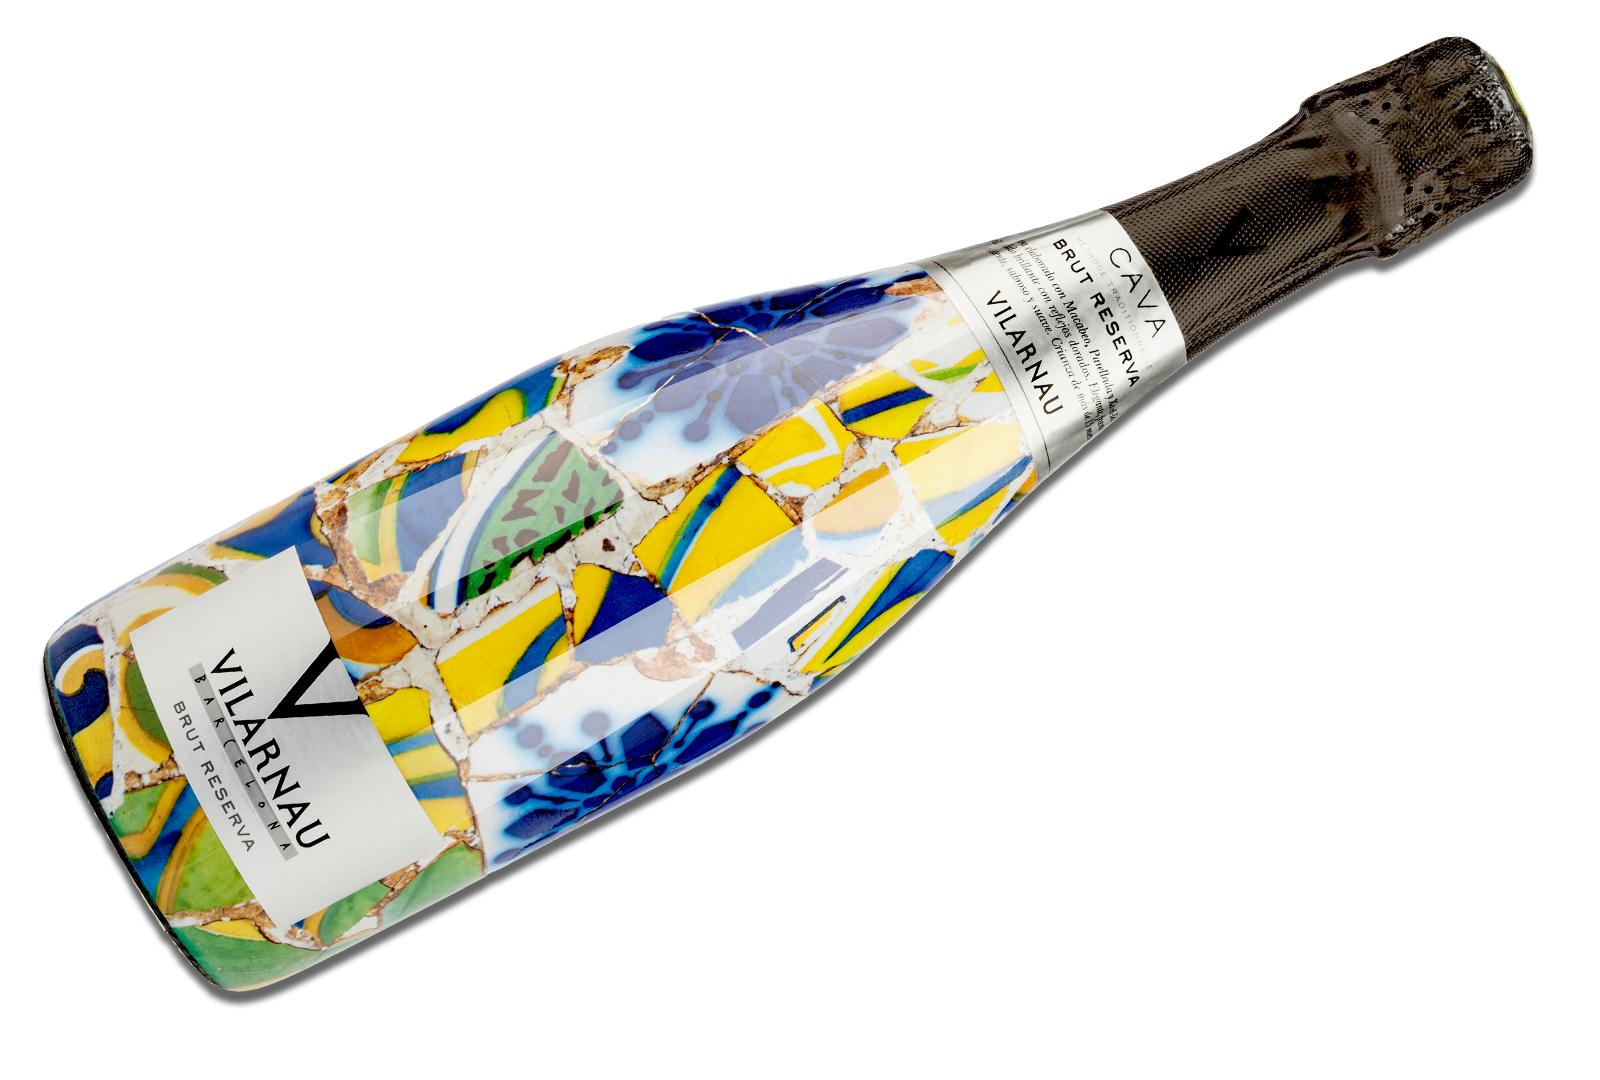 Vilarnau Brut Reserva entre los mejores champagnes.